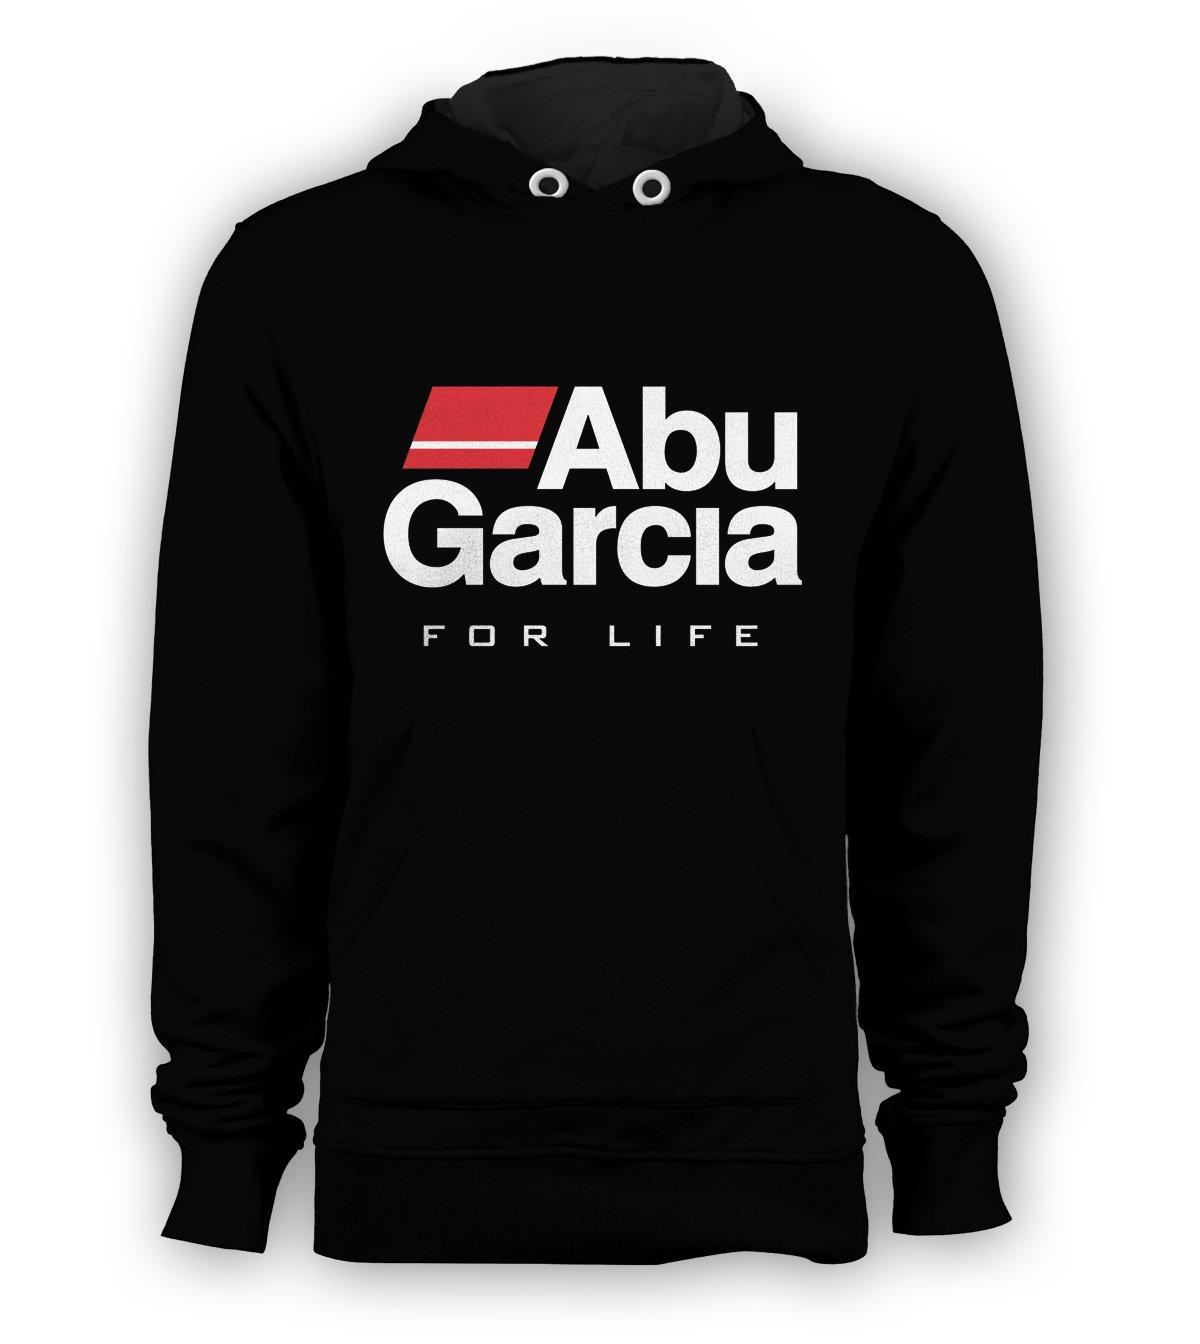 Abu Garcia Fishing Reel Tackle Pullover Hoodie Men Sweatshirts Size S to 3XL New Black